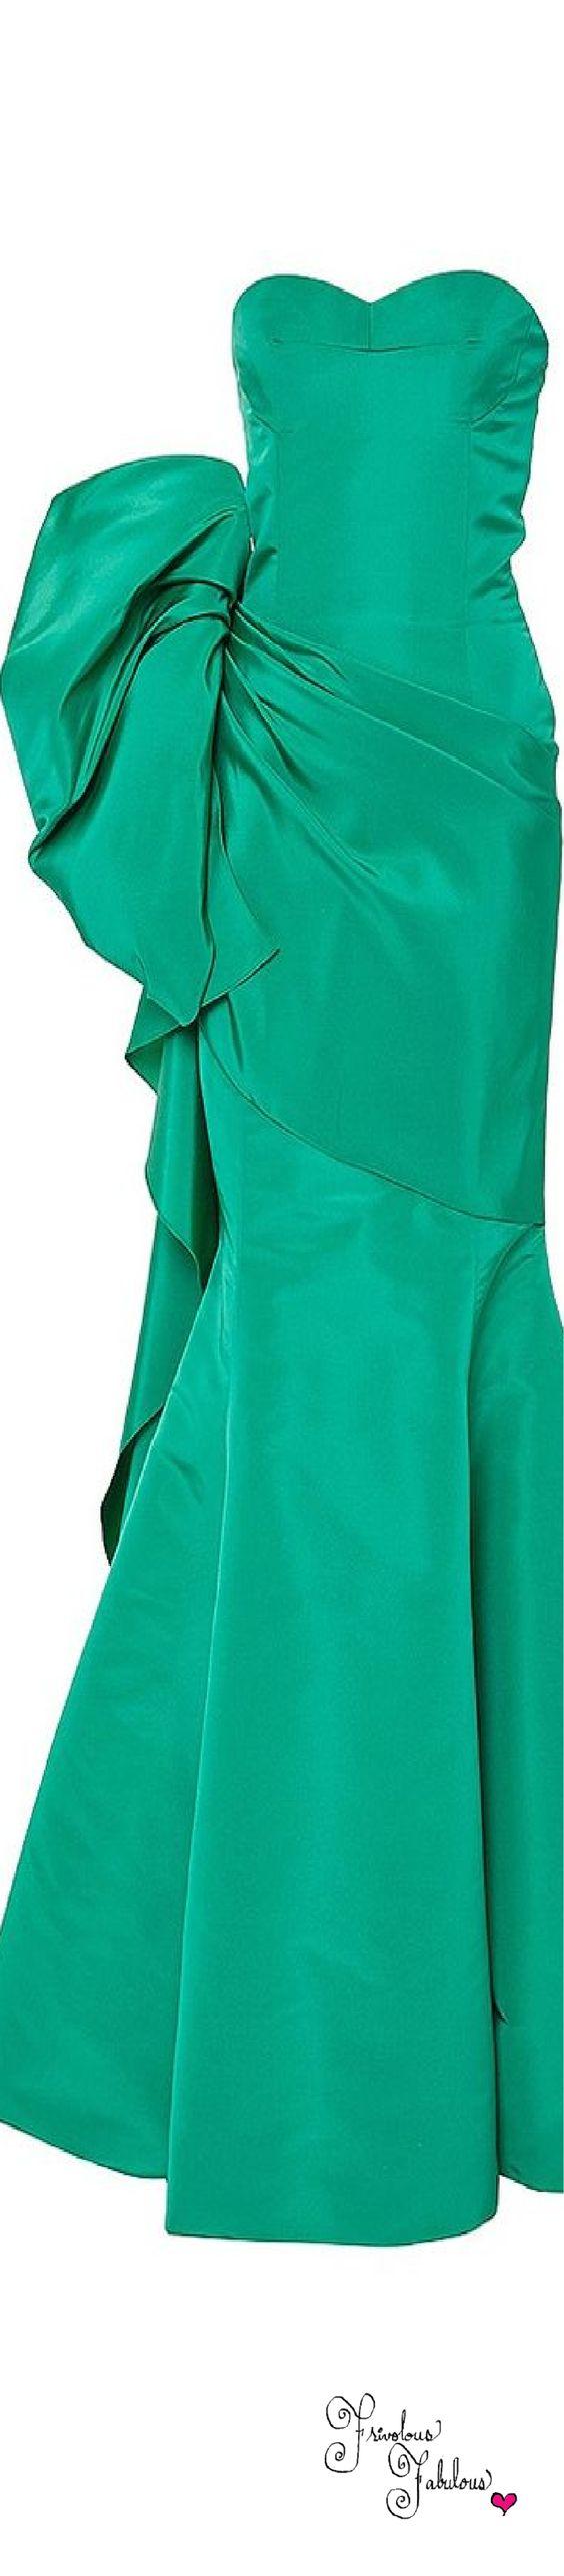 Frivolous Fabulous - Oscar De La Renta Emerald Green Slk Gown Pre Fall 2015